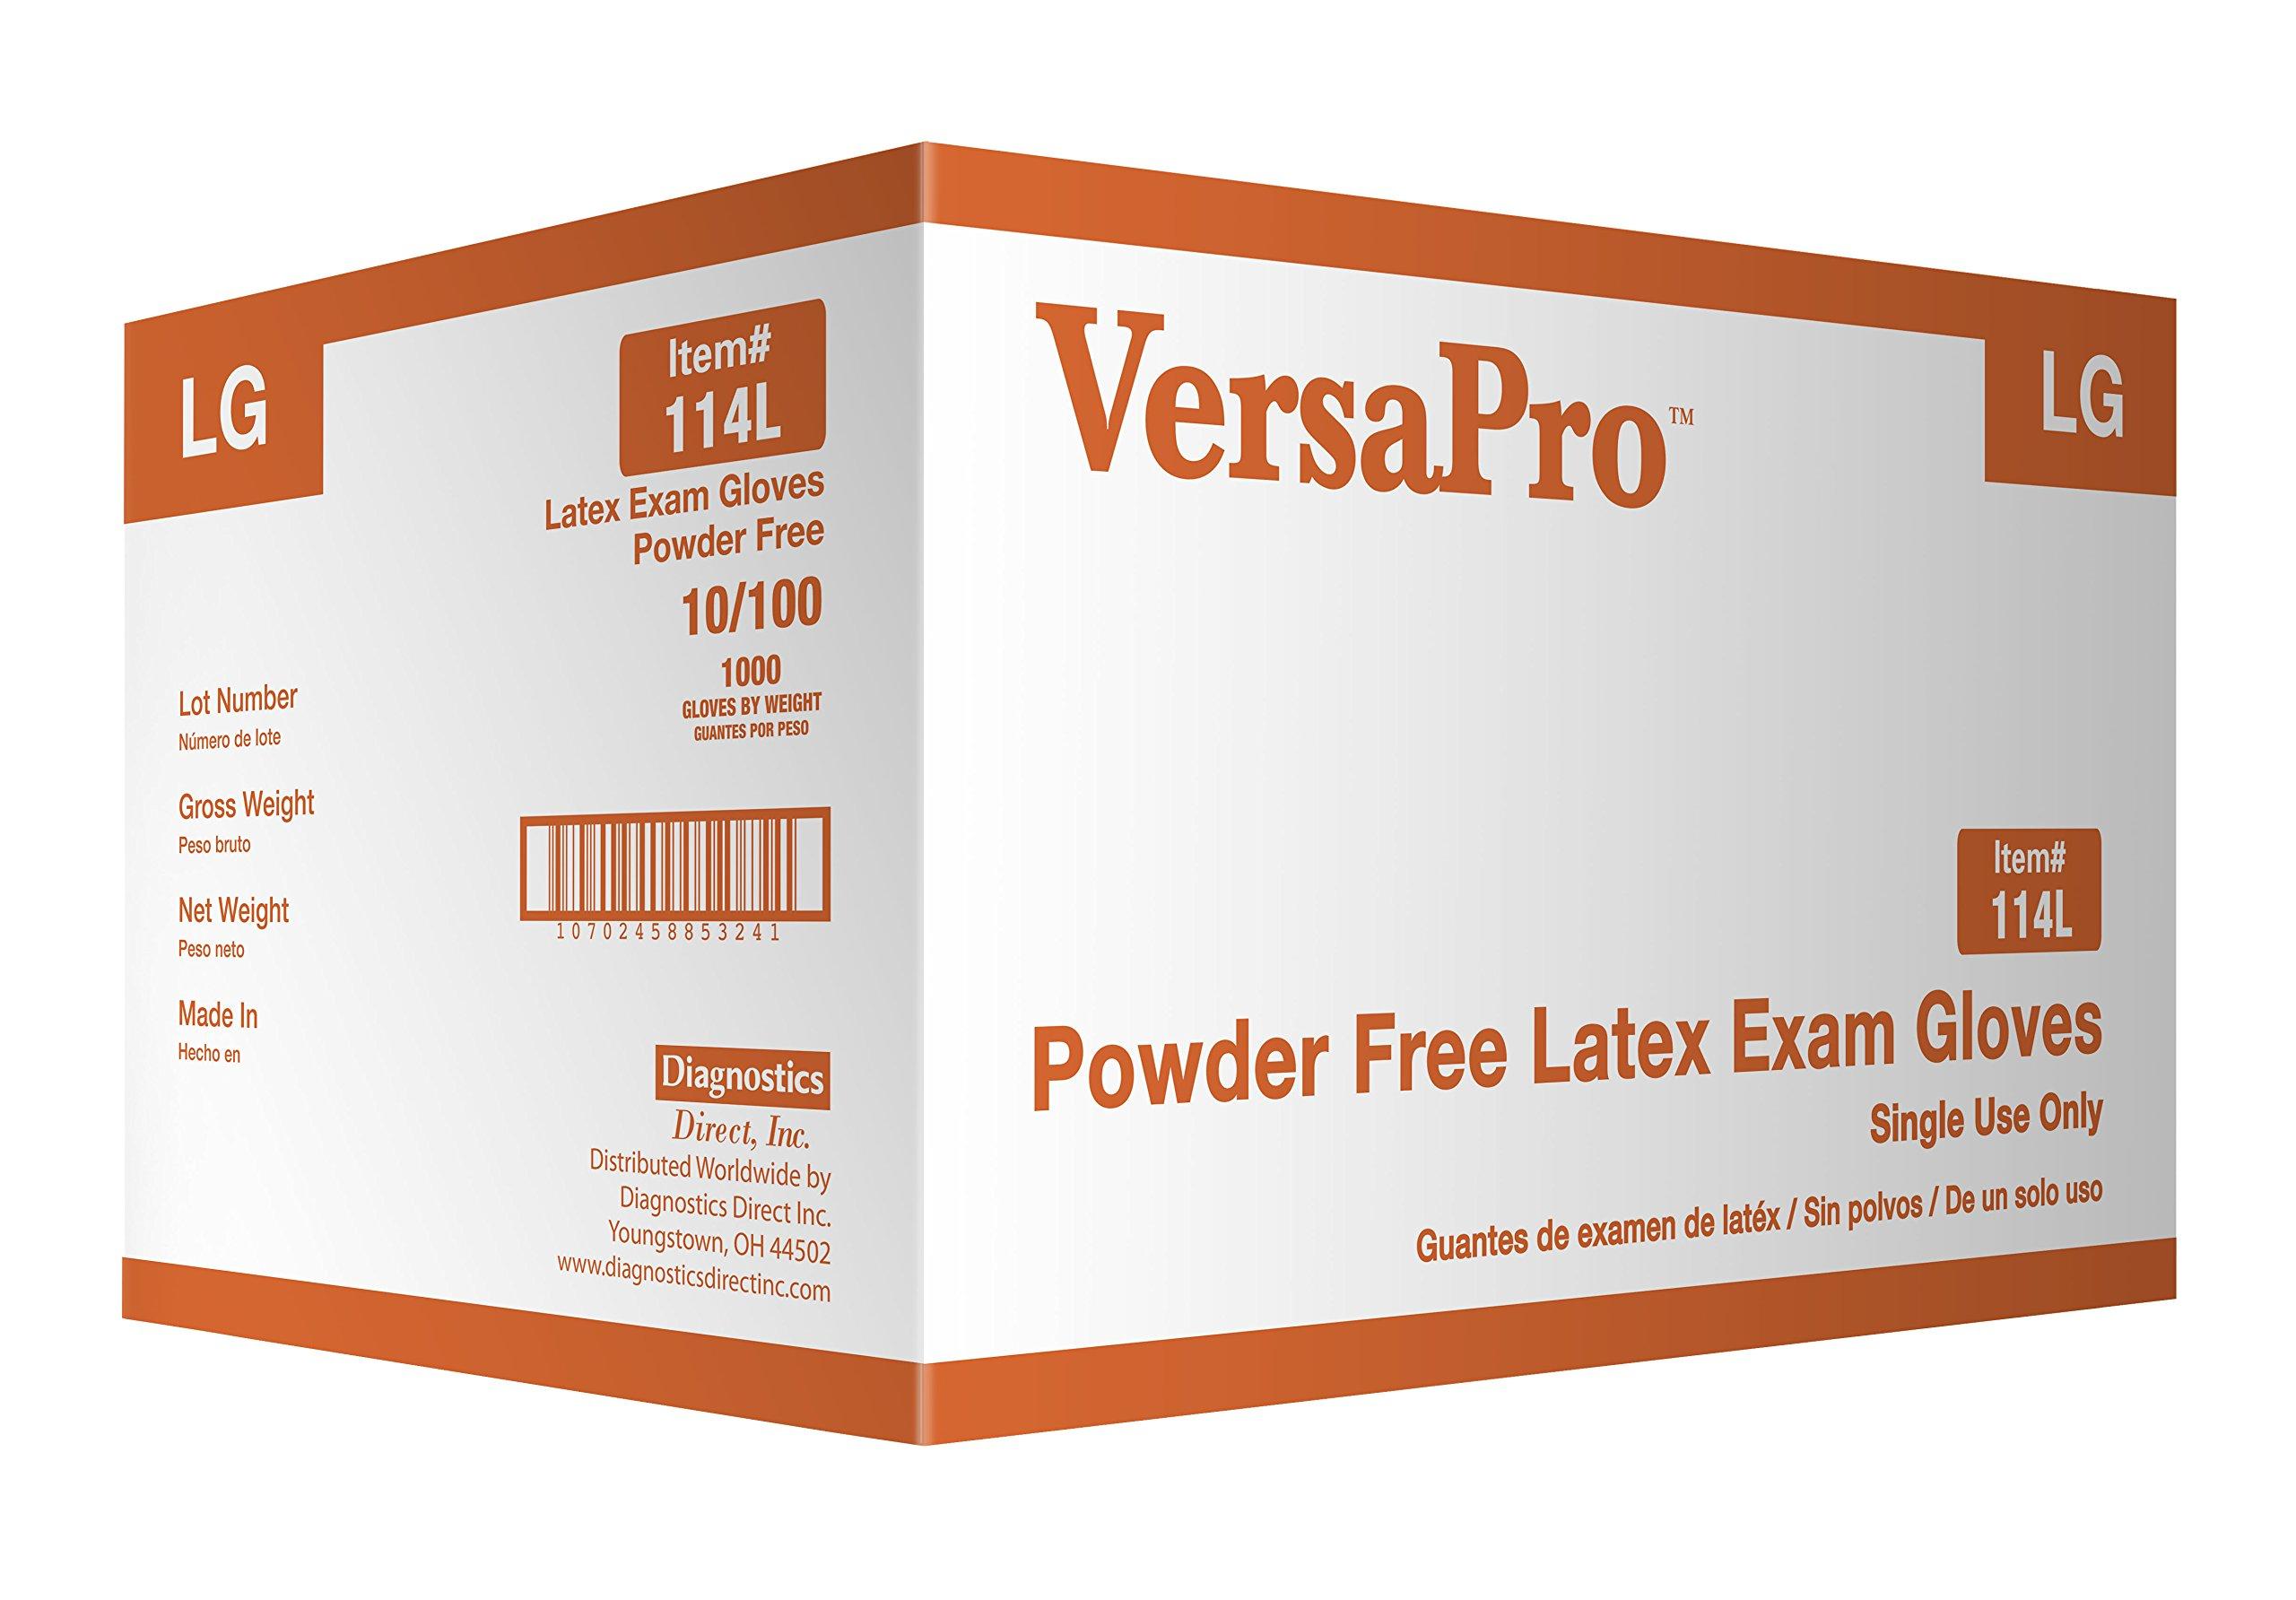 VersaPro 114CL Latex Exam Gloves Powder-Free, Large (Pack of 1000)